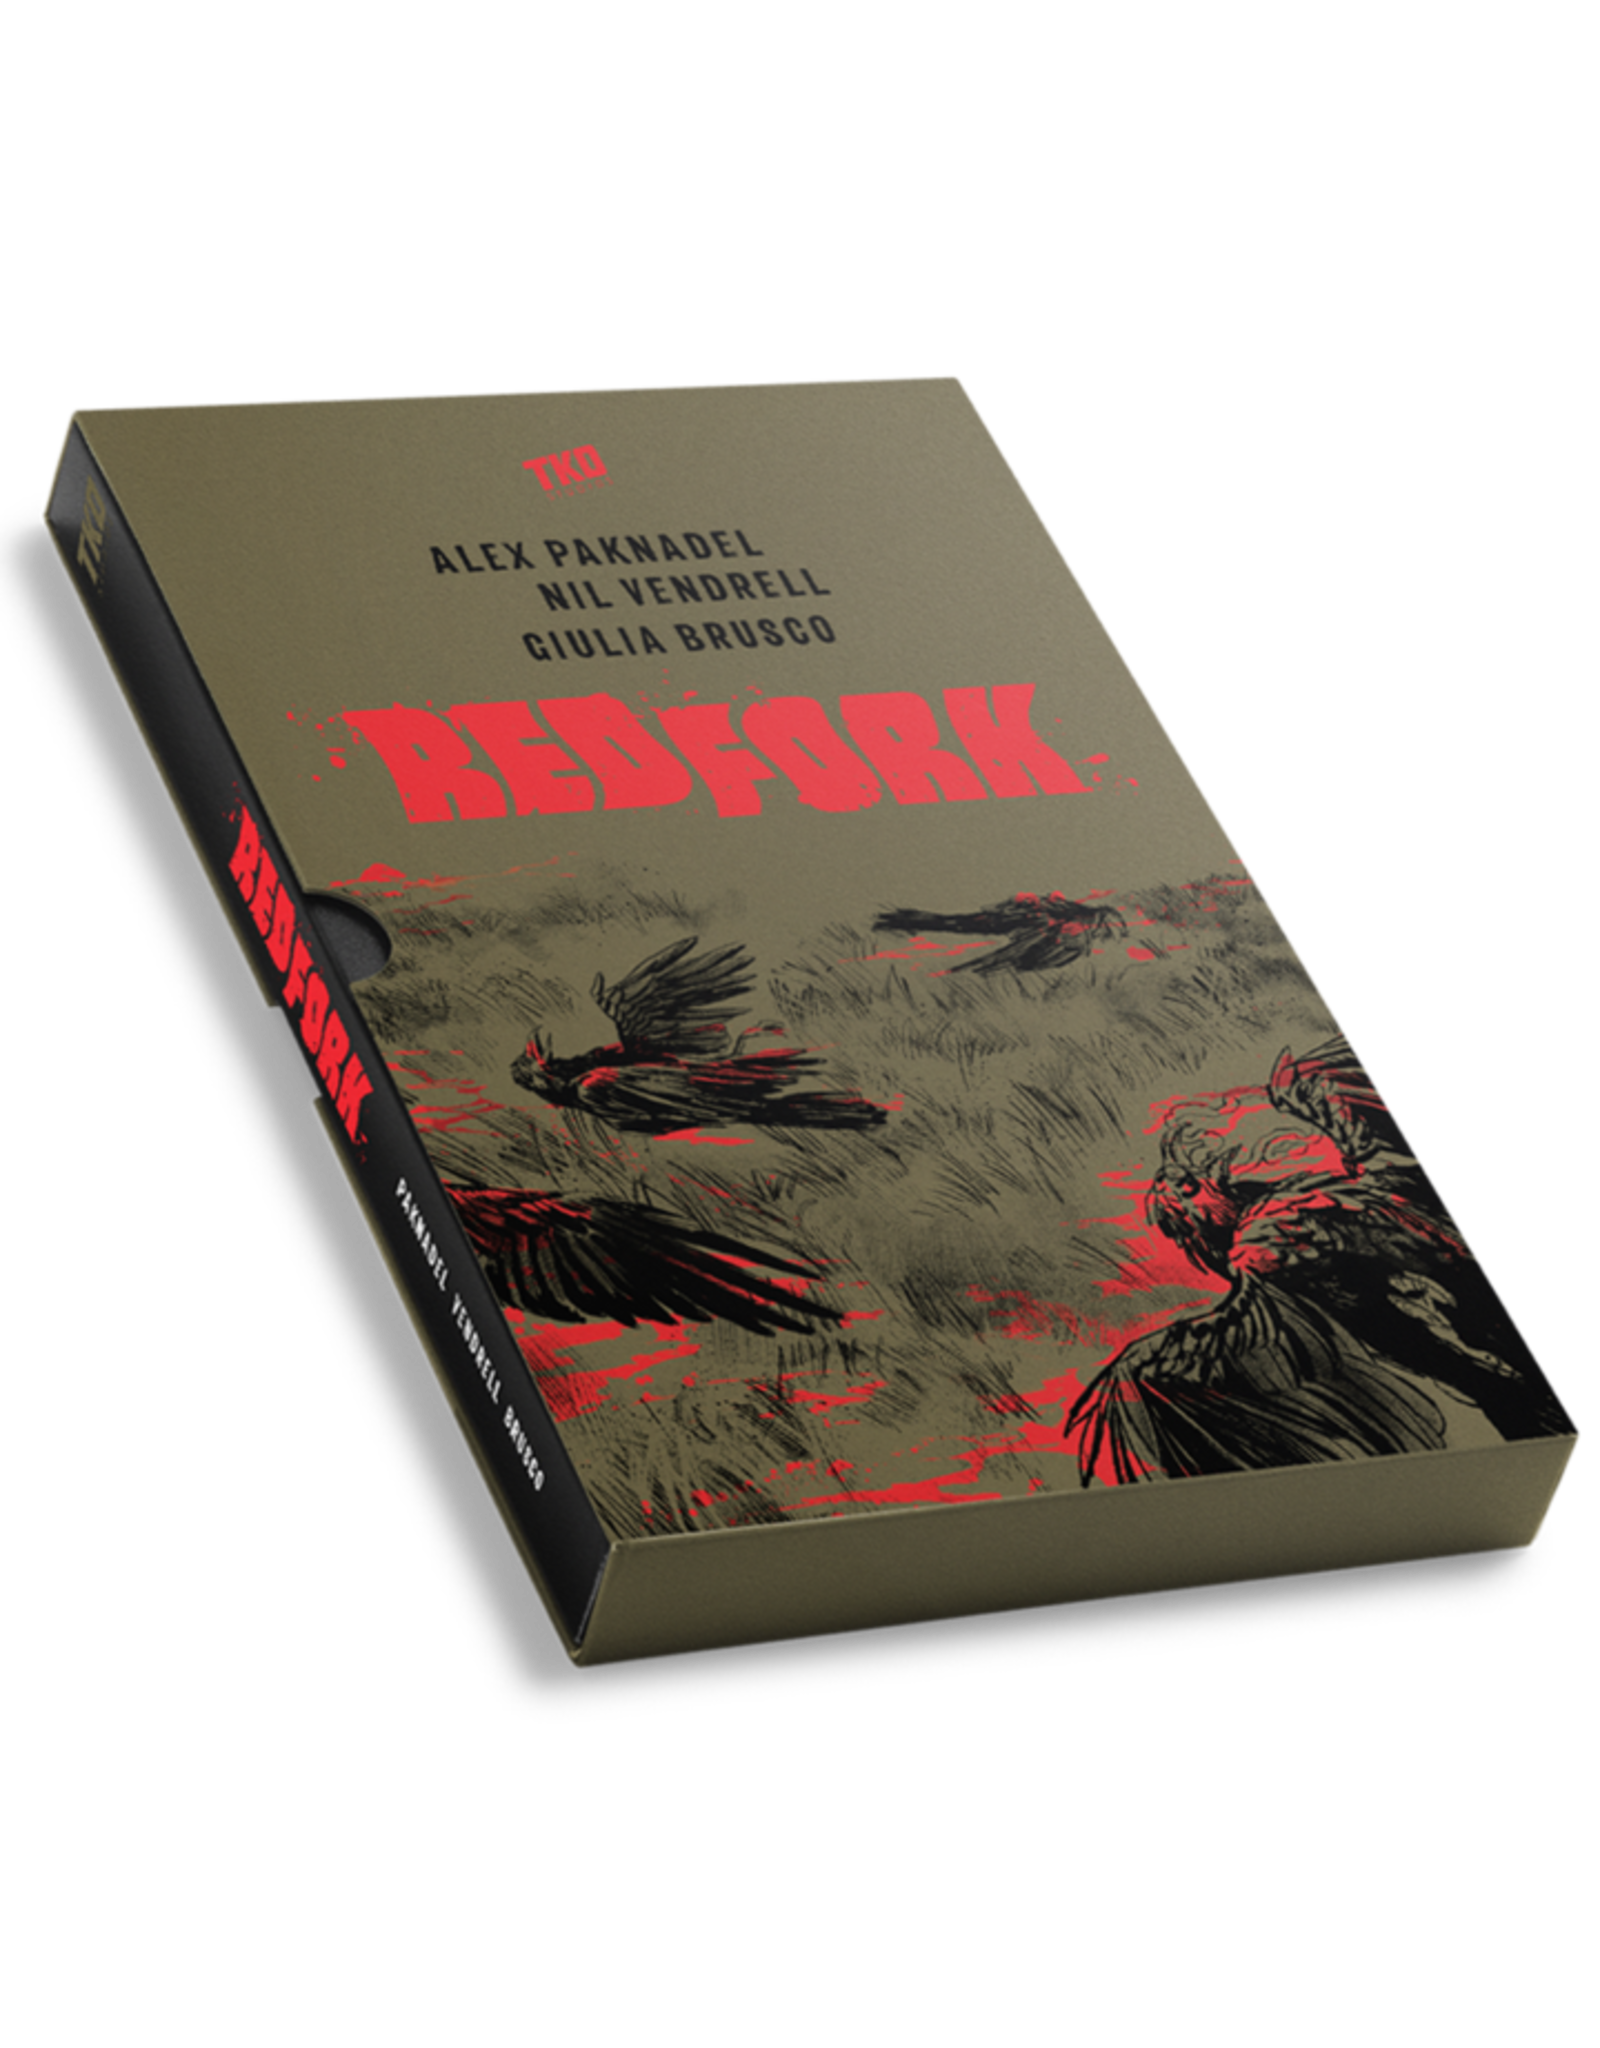 REDFORK SIX ISSUE BOX SET